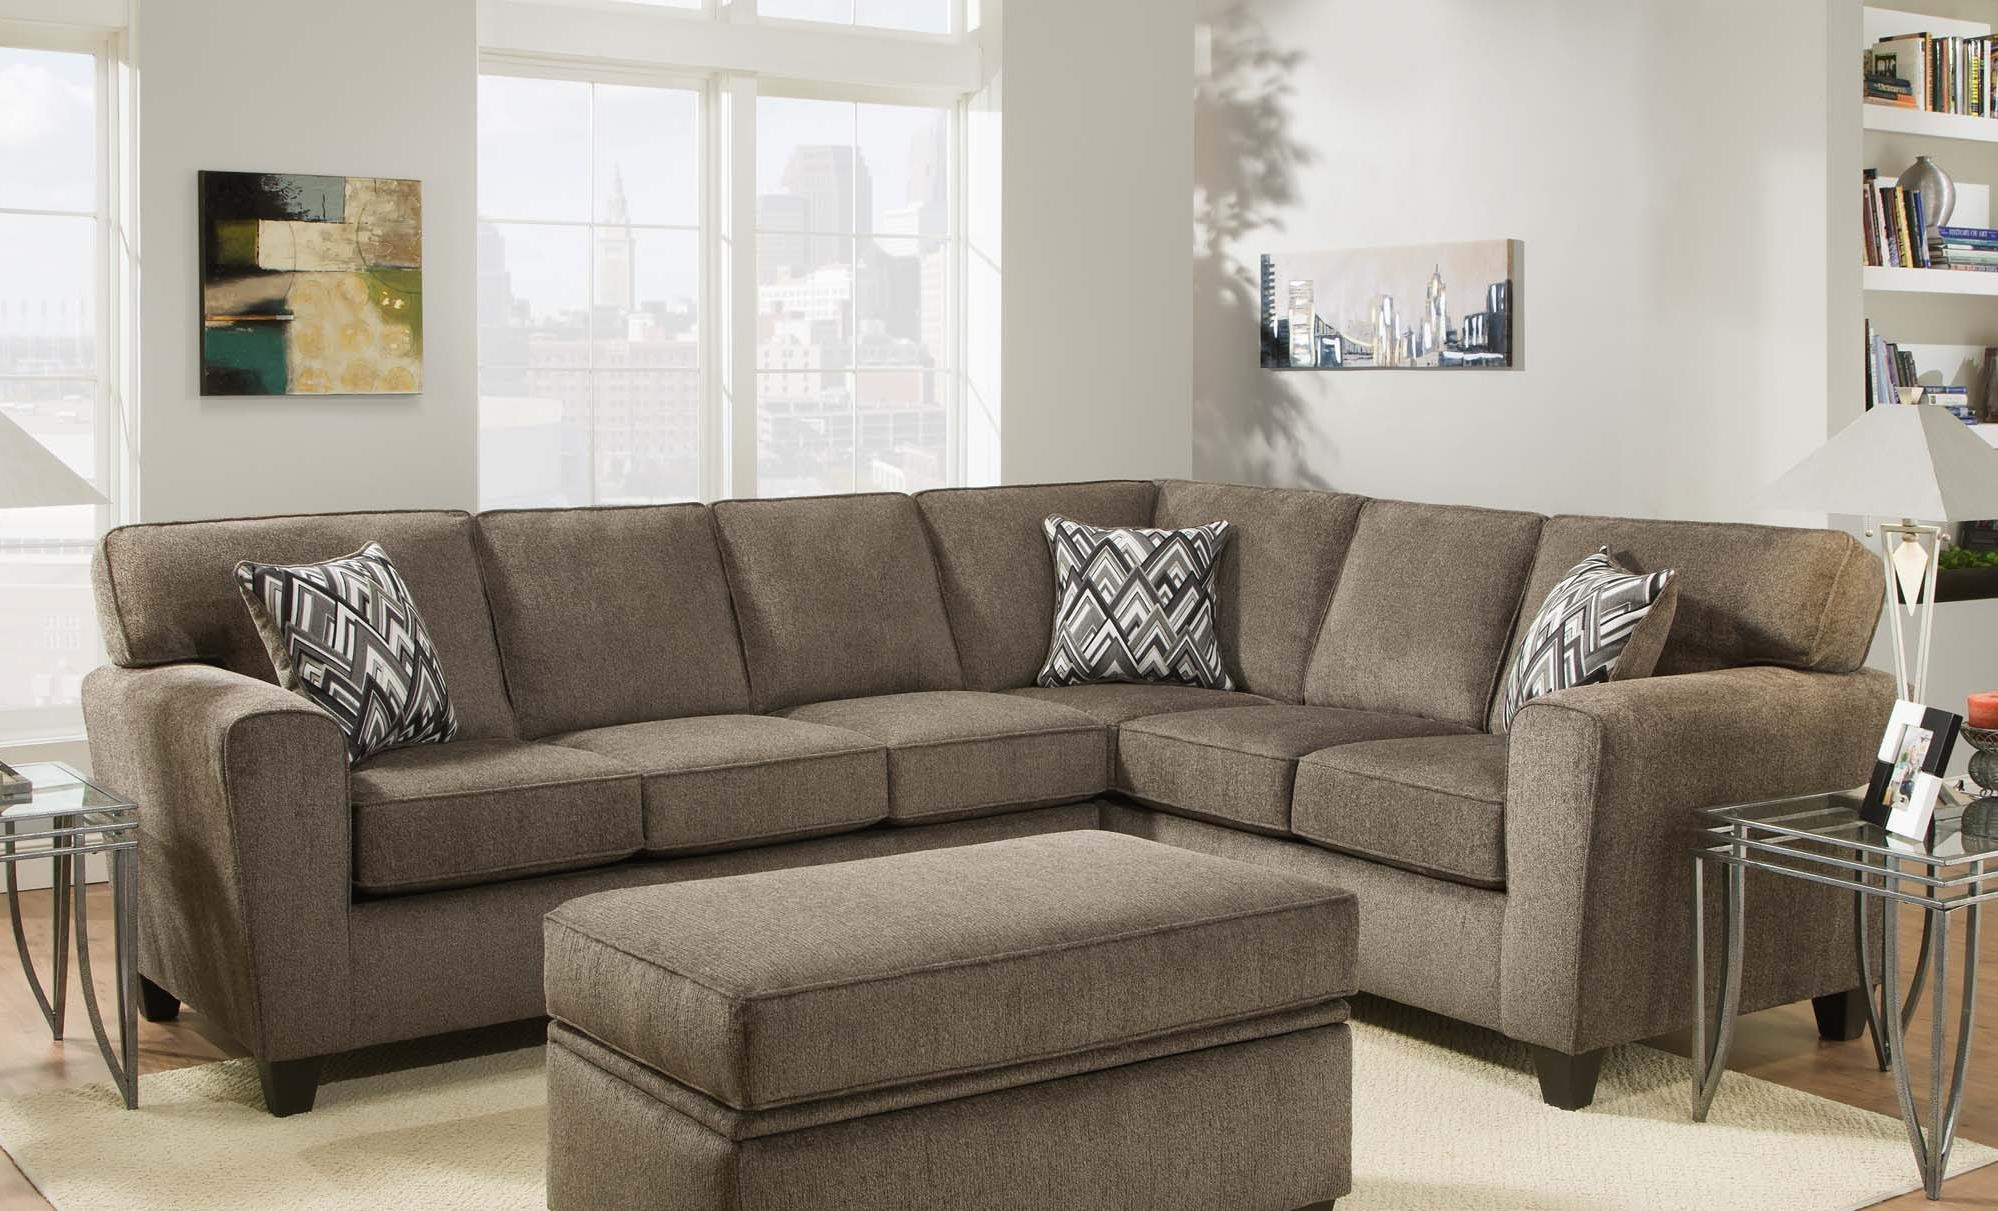 sofas furniture world urban style sofa bed 1156 s set